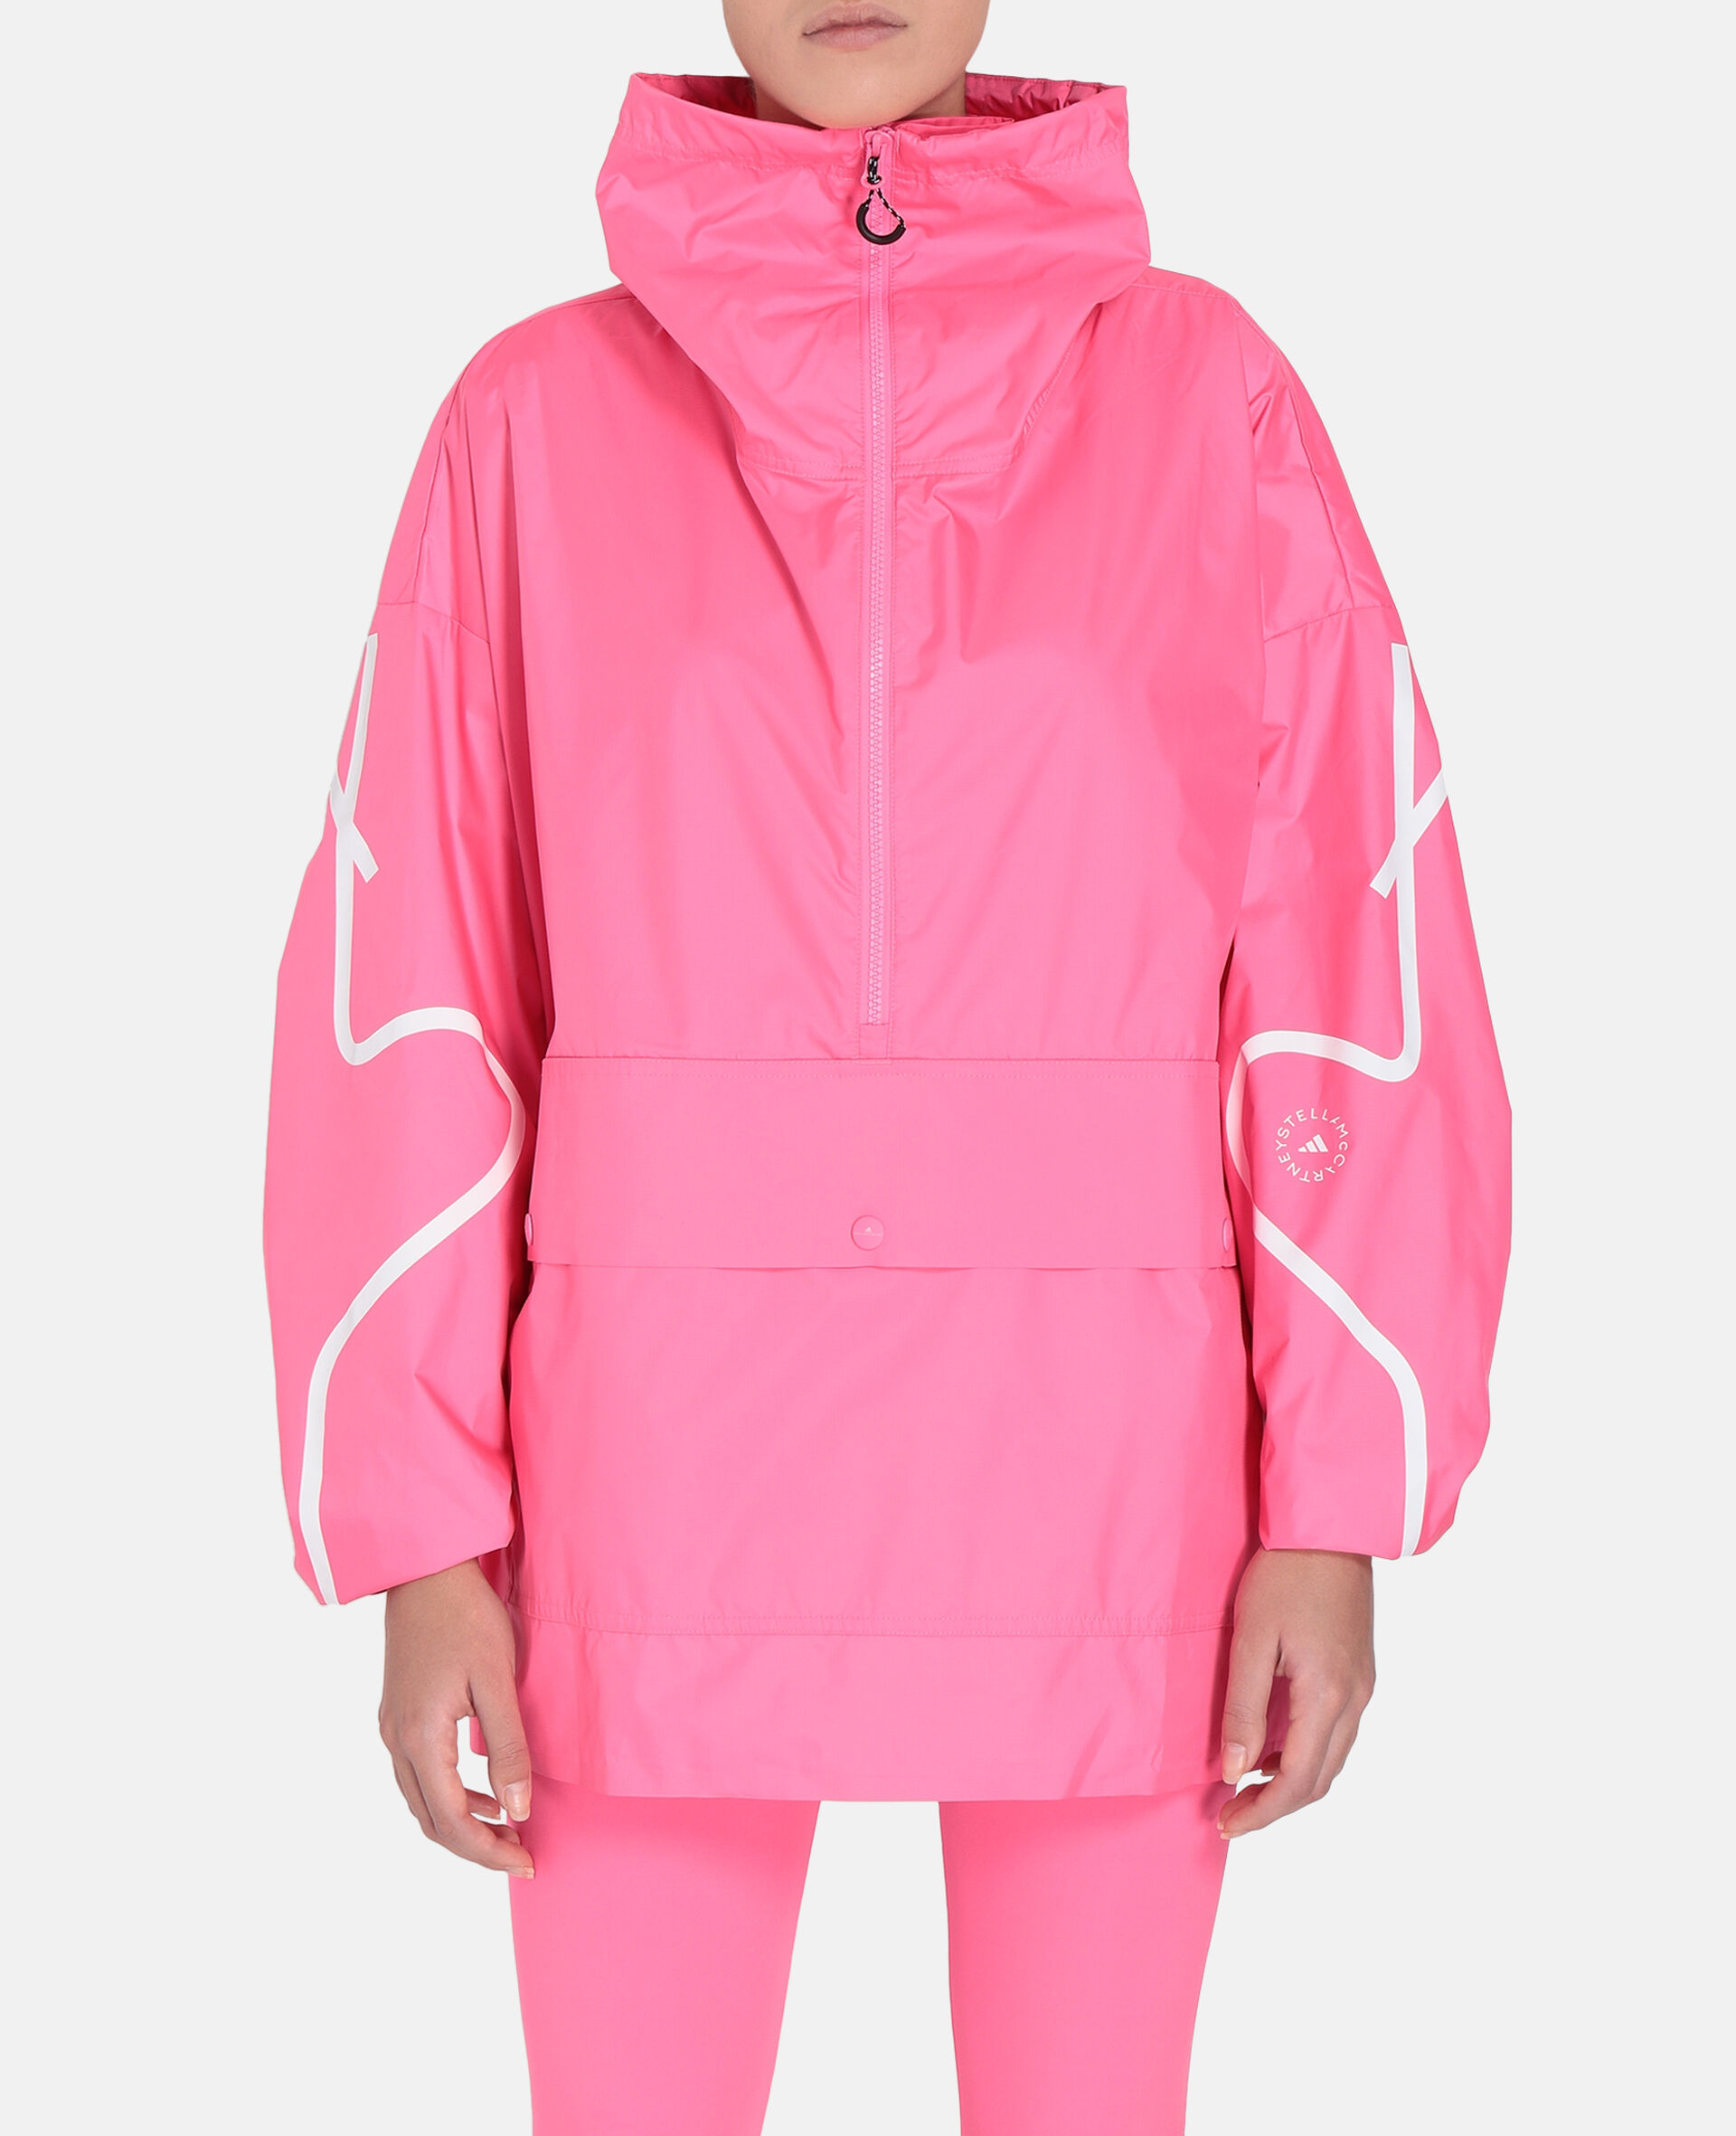 Pink Half-Zip Jacket-Pink-large image number 4